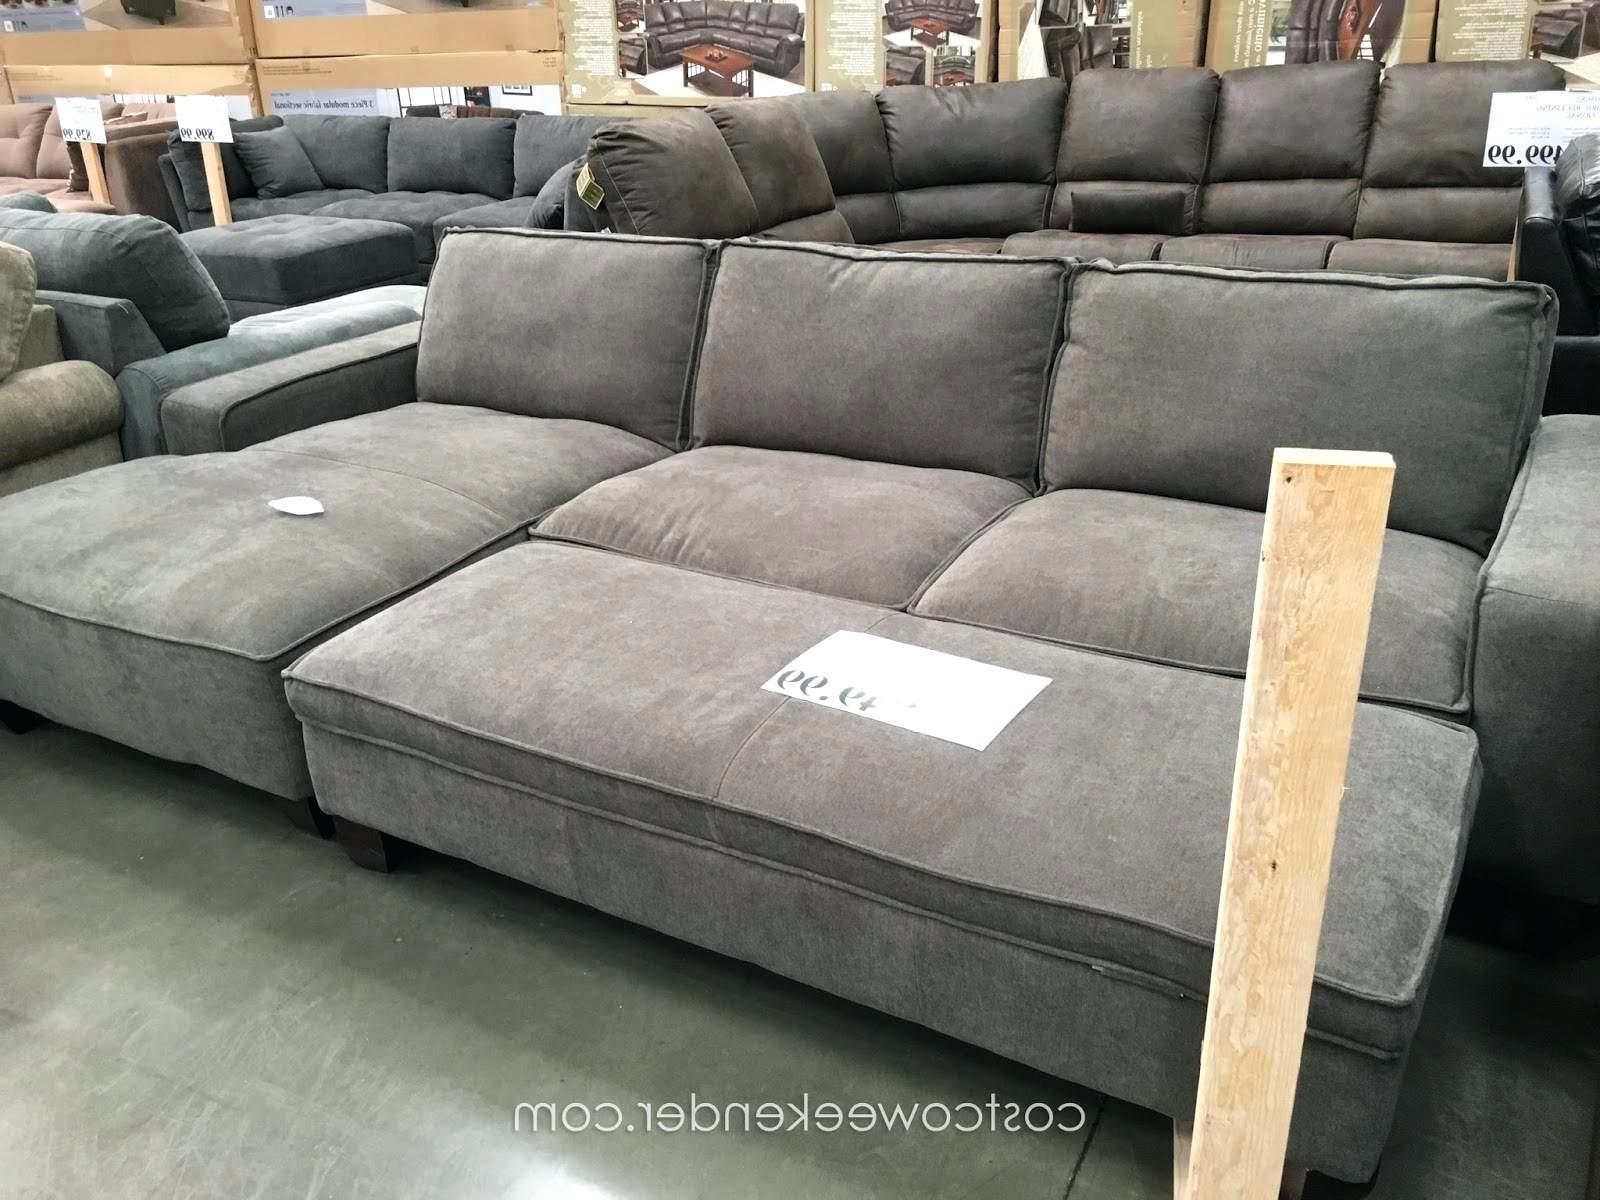 Newest Berkline Sofas Throughout Berkline Sofa Recliner Costco And Loveseat – Jasonatavastrealty (View 9 of 20)